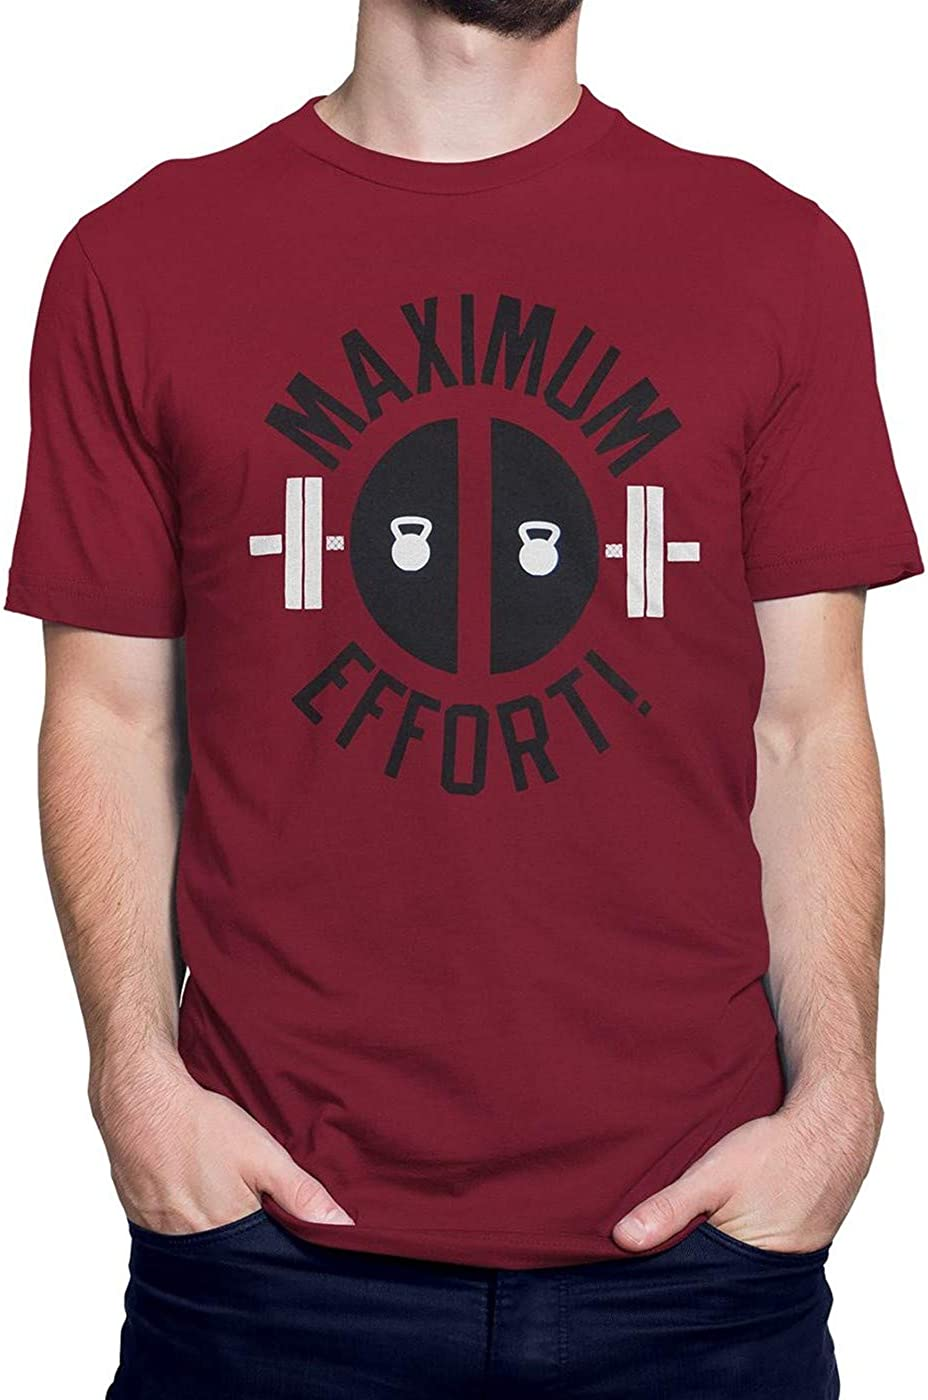 Deadpool Maximum Effort inspired T-Shirt Movie T-Shirt Gym T Shirt